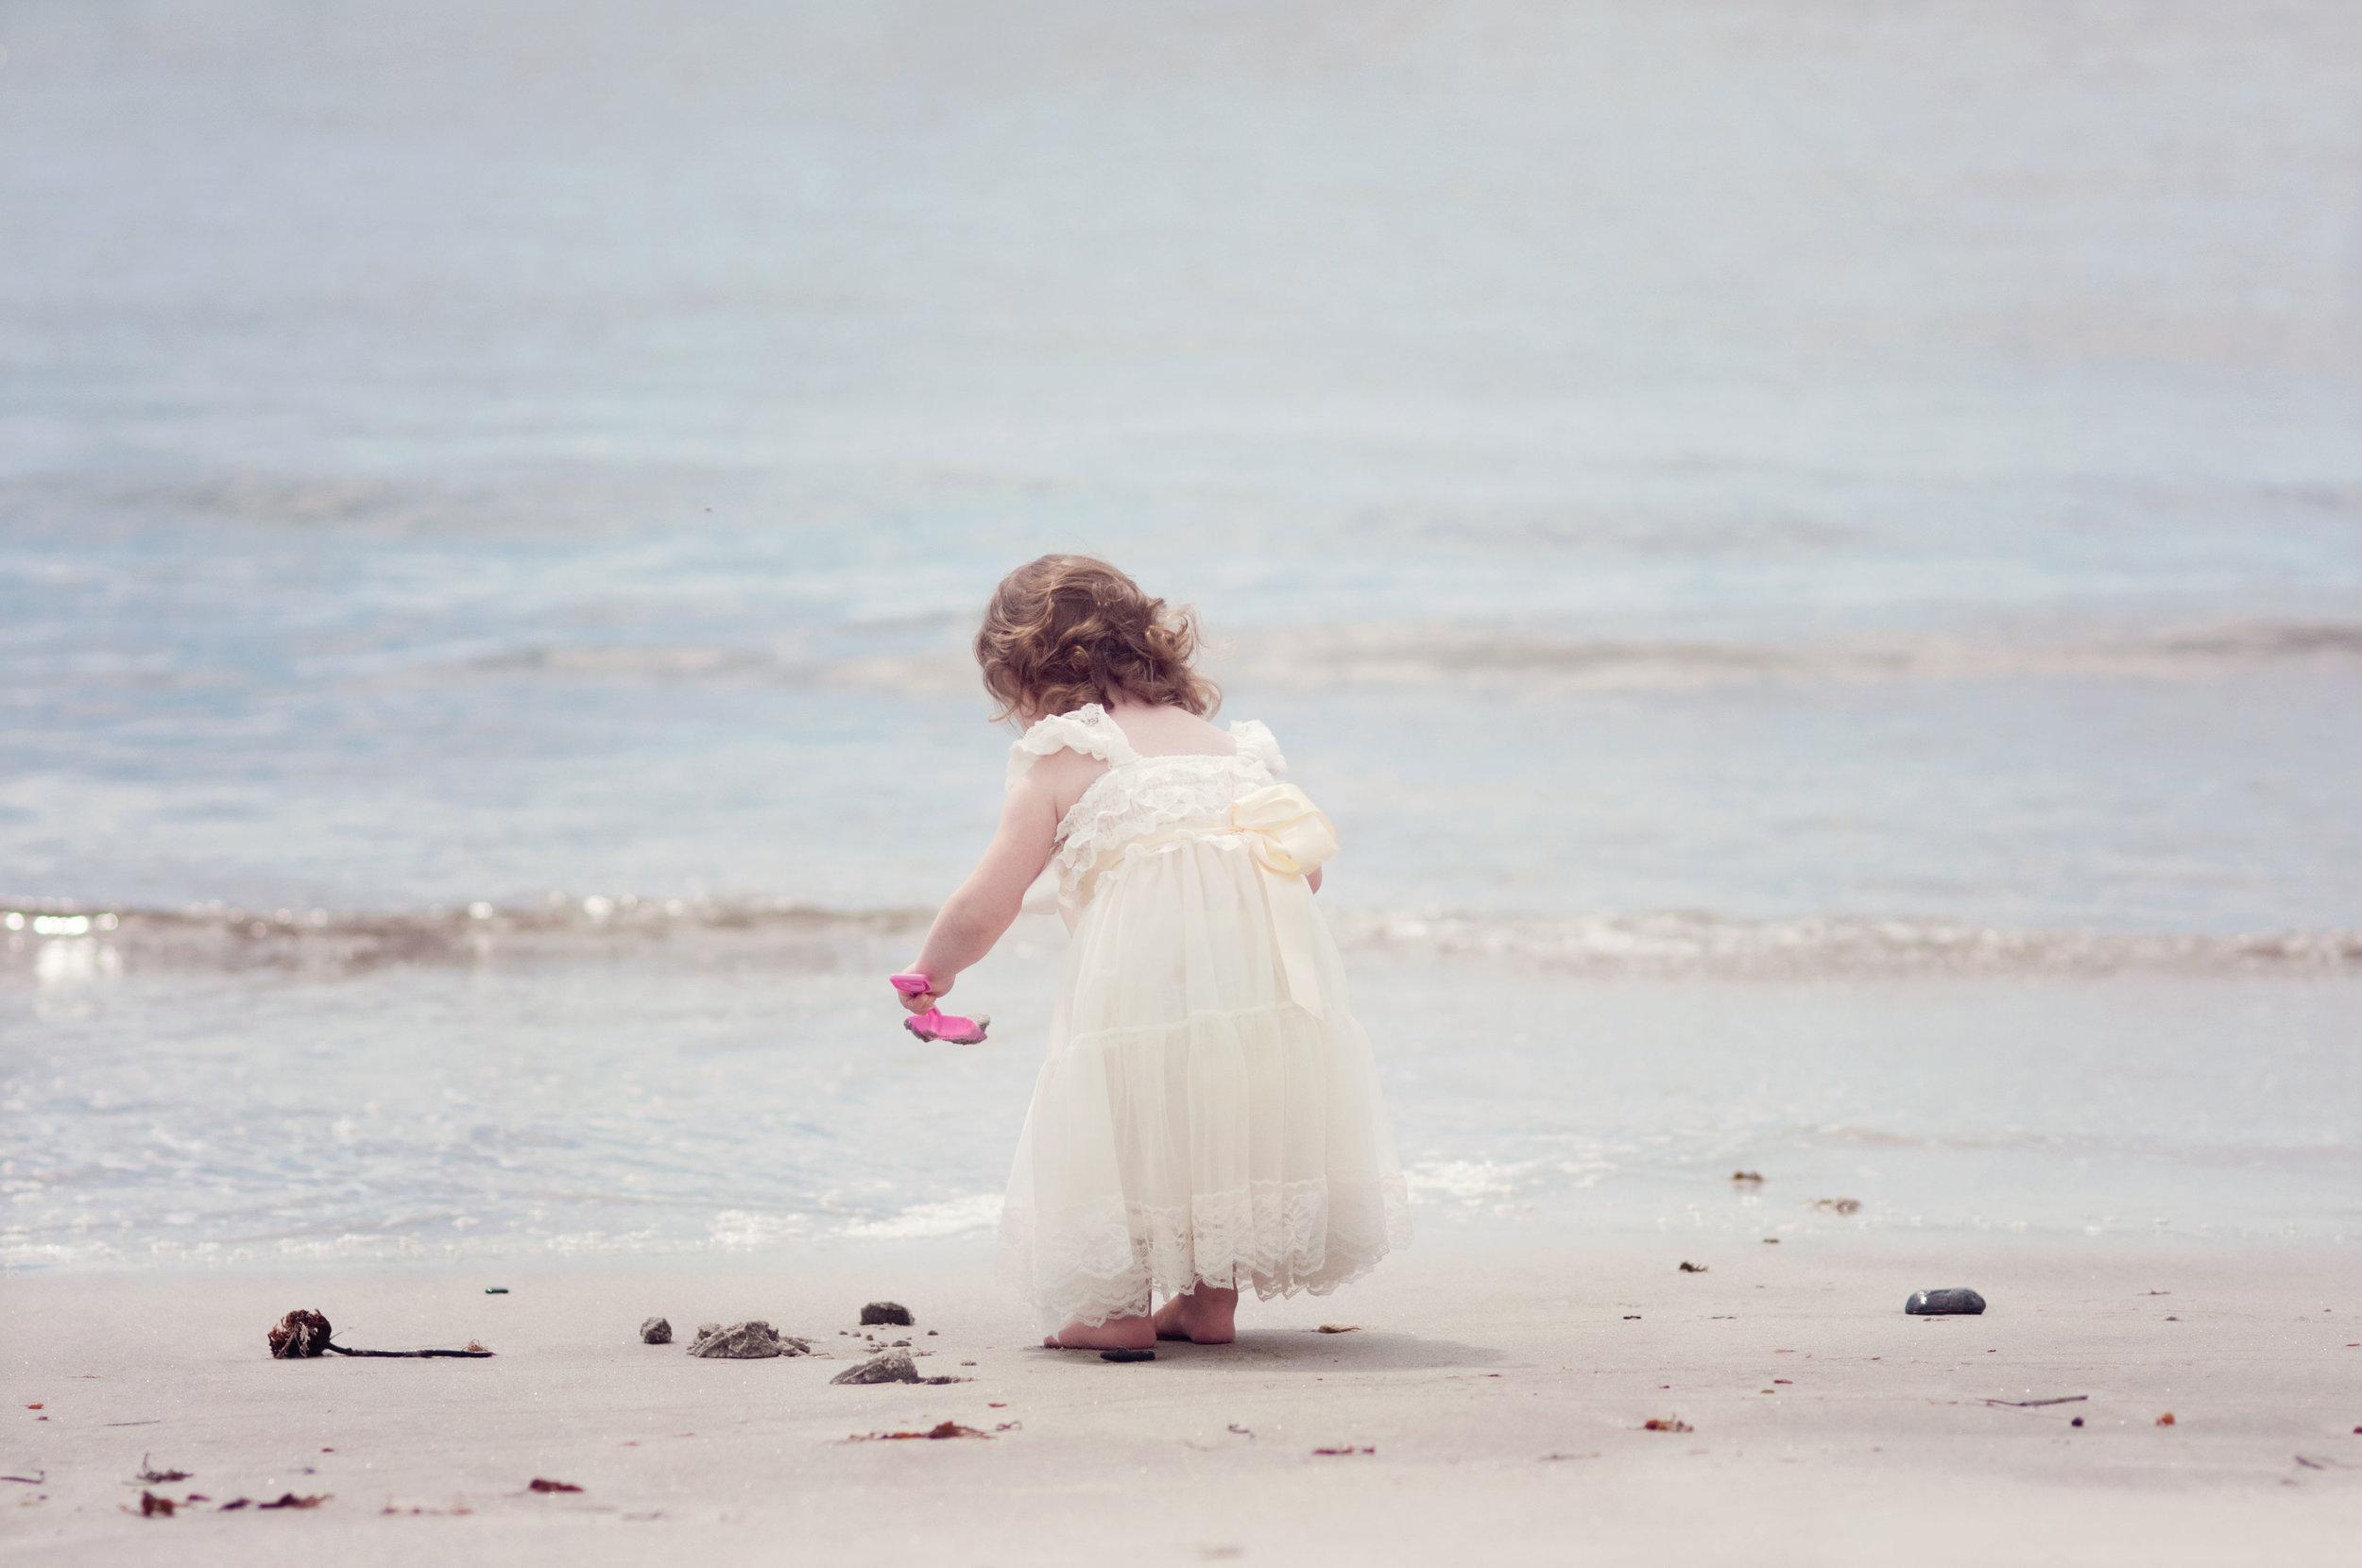 Pemaquid Beach Princess playing in the sand